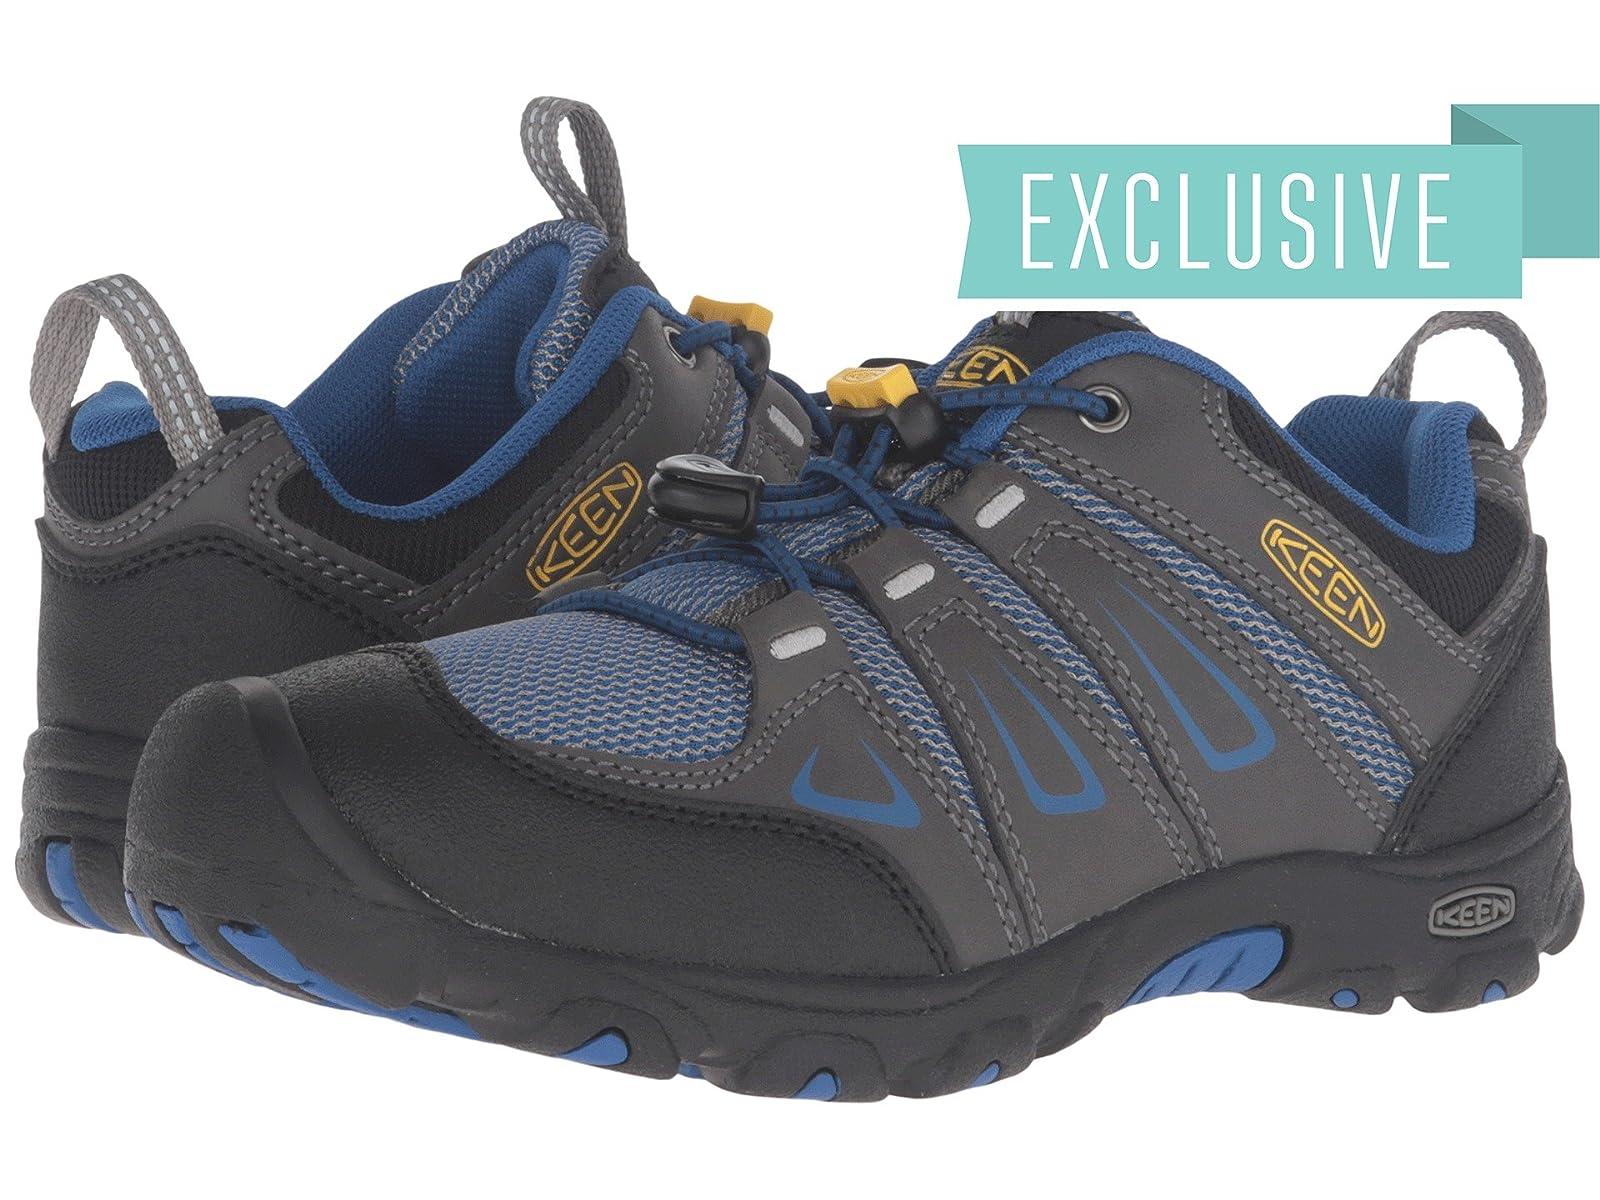 Keen Kids Oakridge Low (Little Kid/Big Kid)Atmospheric grades have affordable shoes